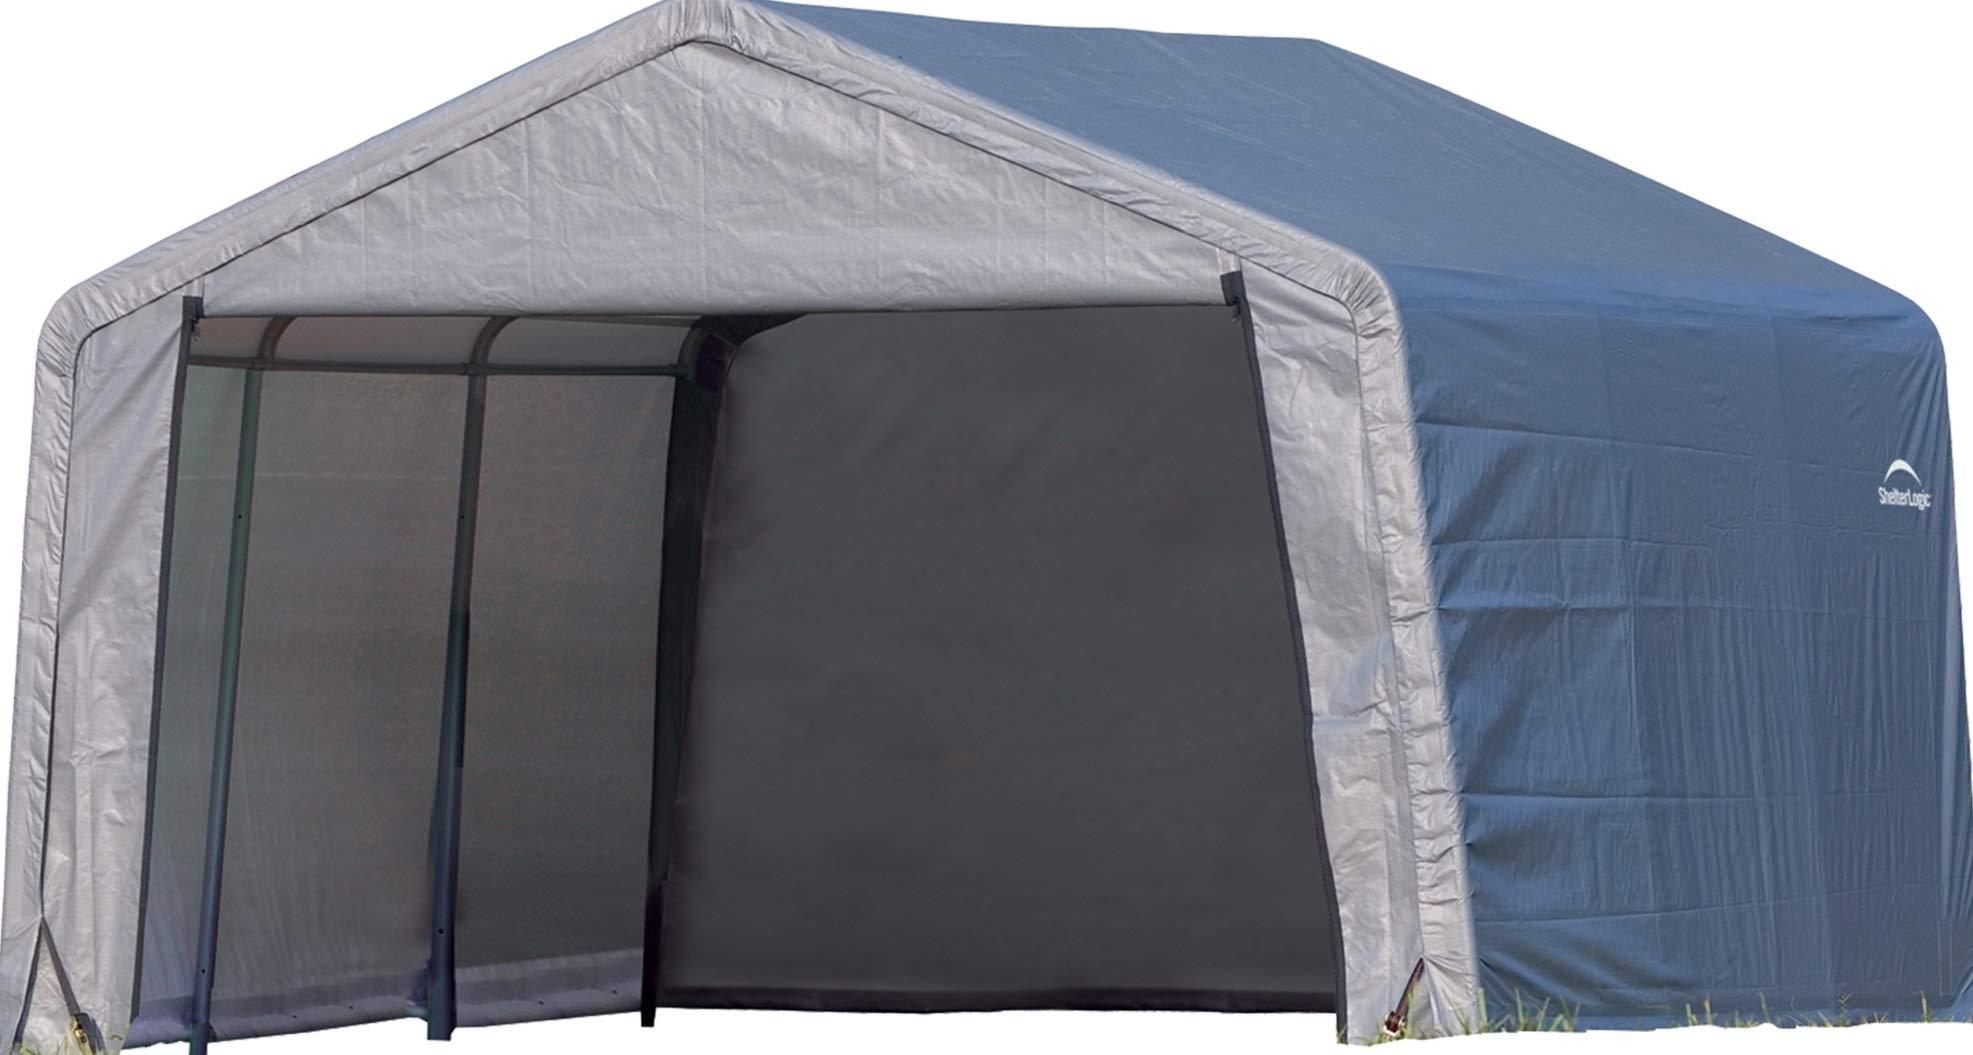 ShelterLogic 12' x 12' Shed-in-a-Box All Season